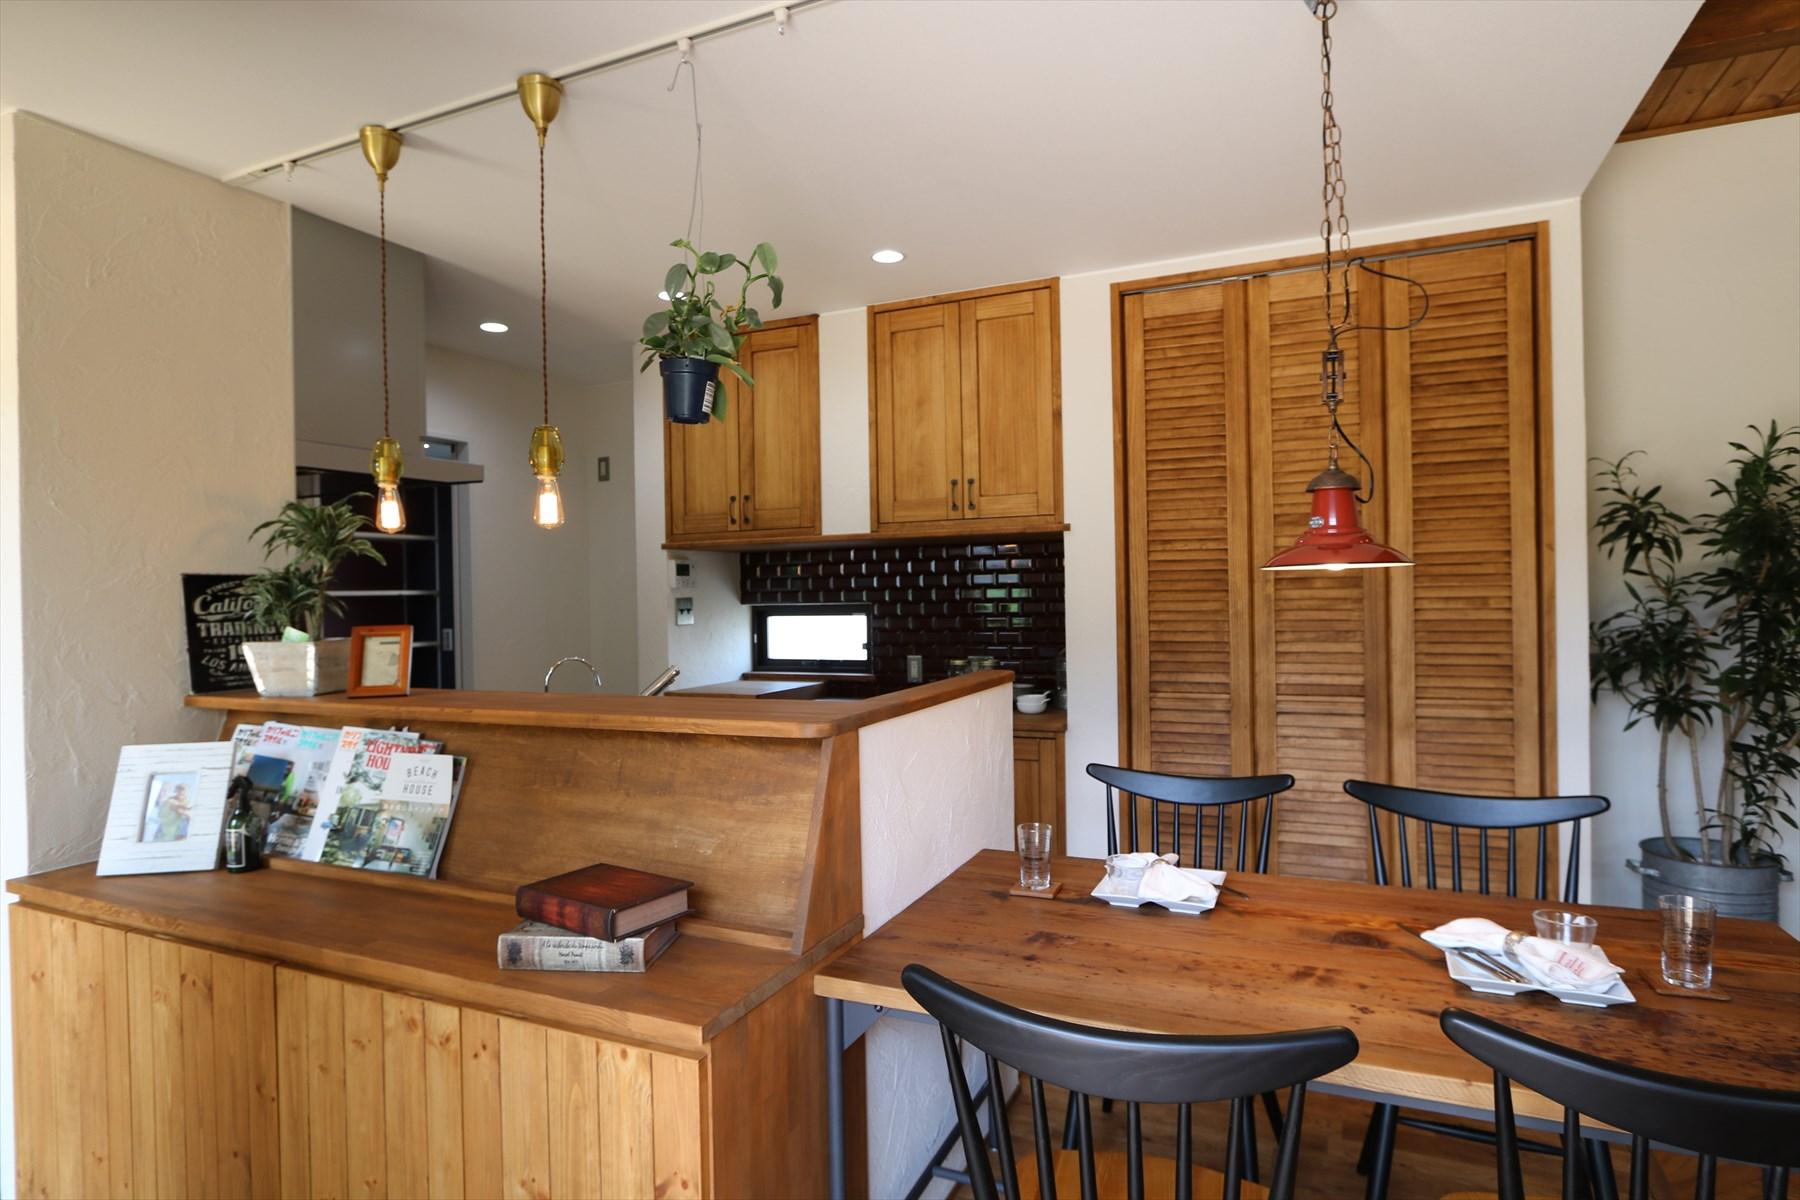 REAL SURFER'S HOUSE|石川県金沢市の注文住宅・デザイン性・新築の家・戸建て|E-HOUSE